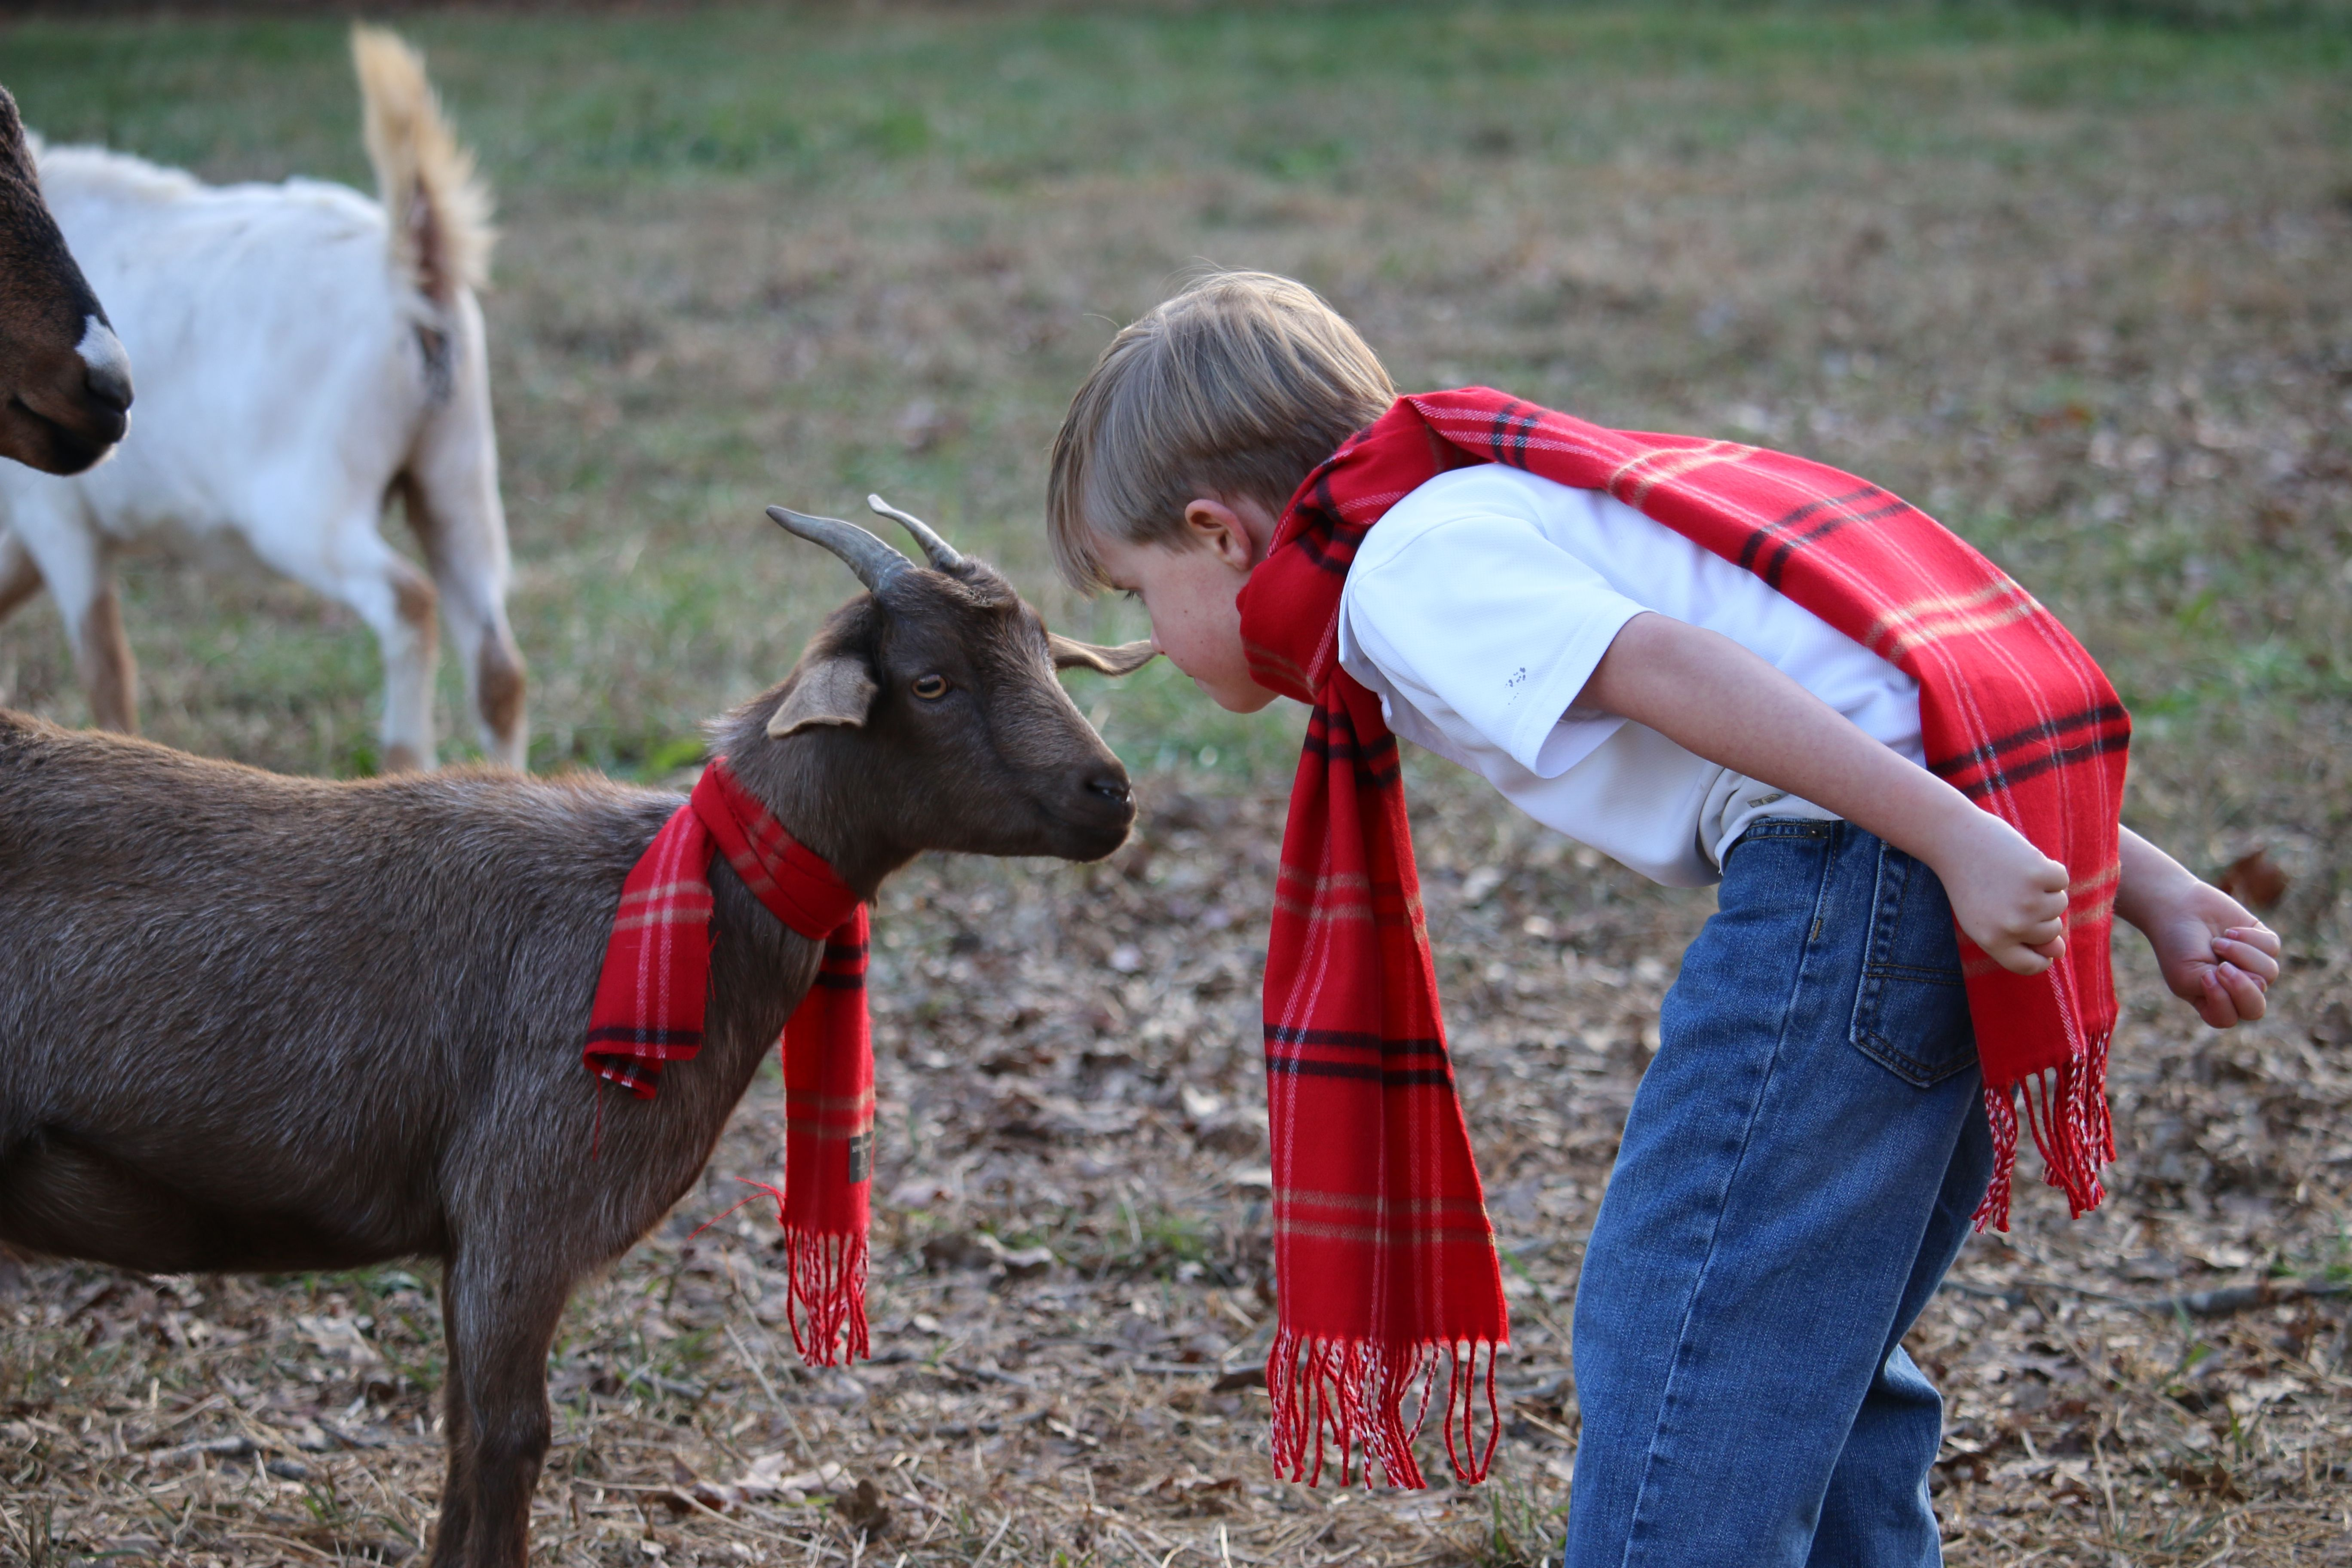 Christmas goat picture goat picture christmas pictures